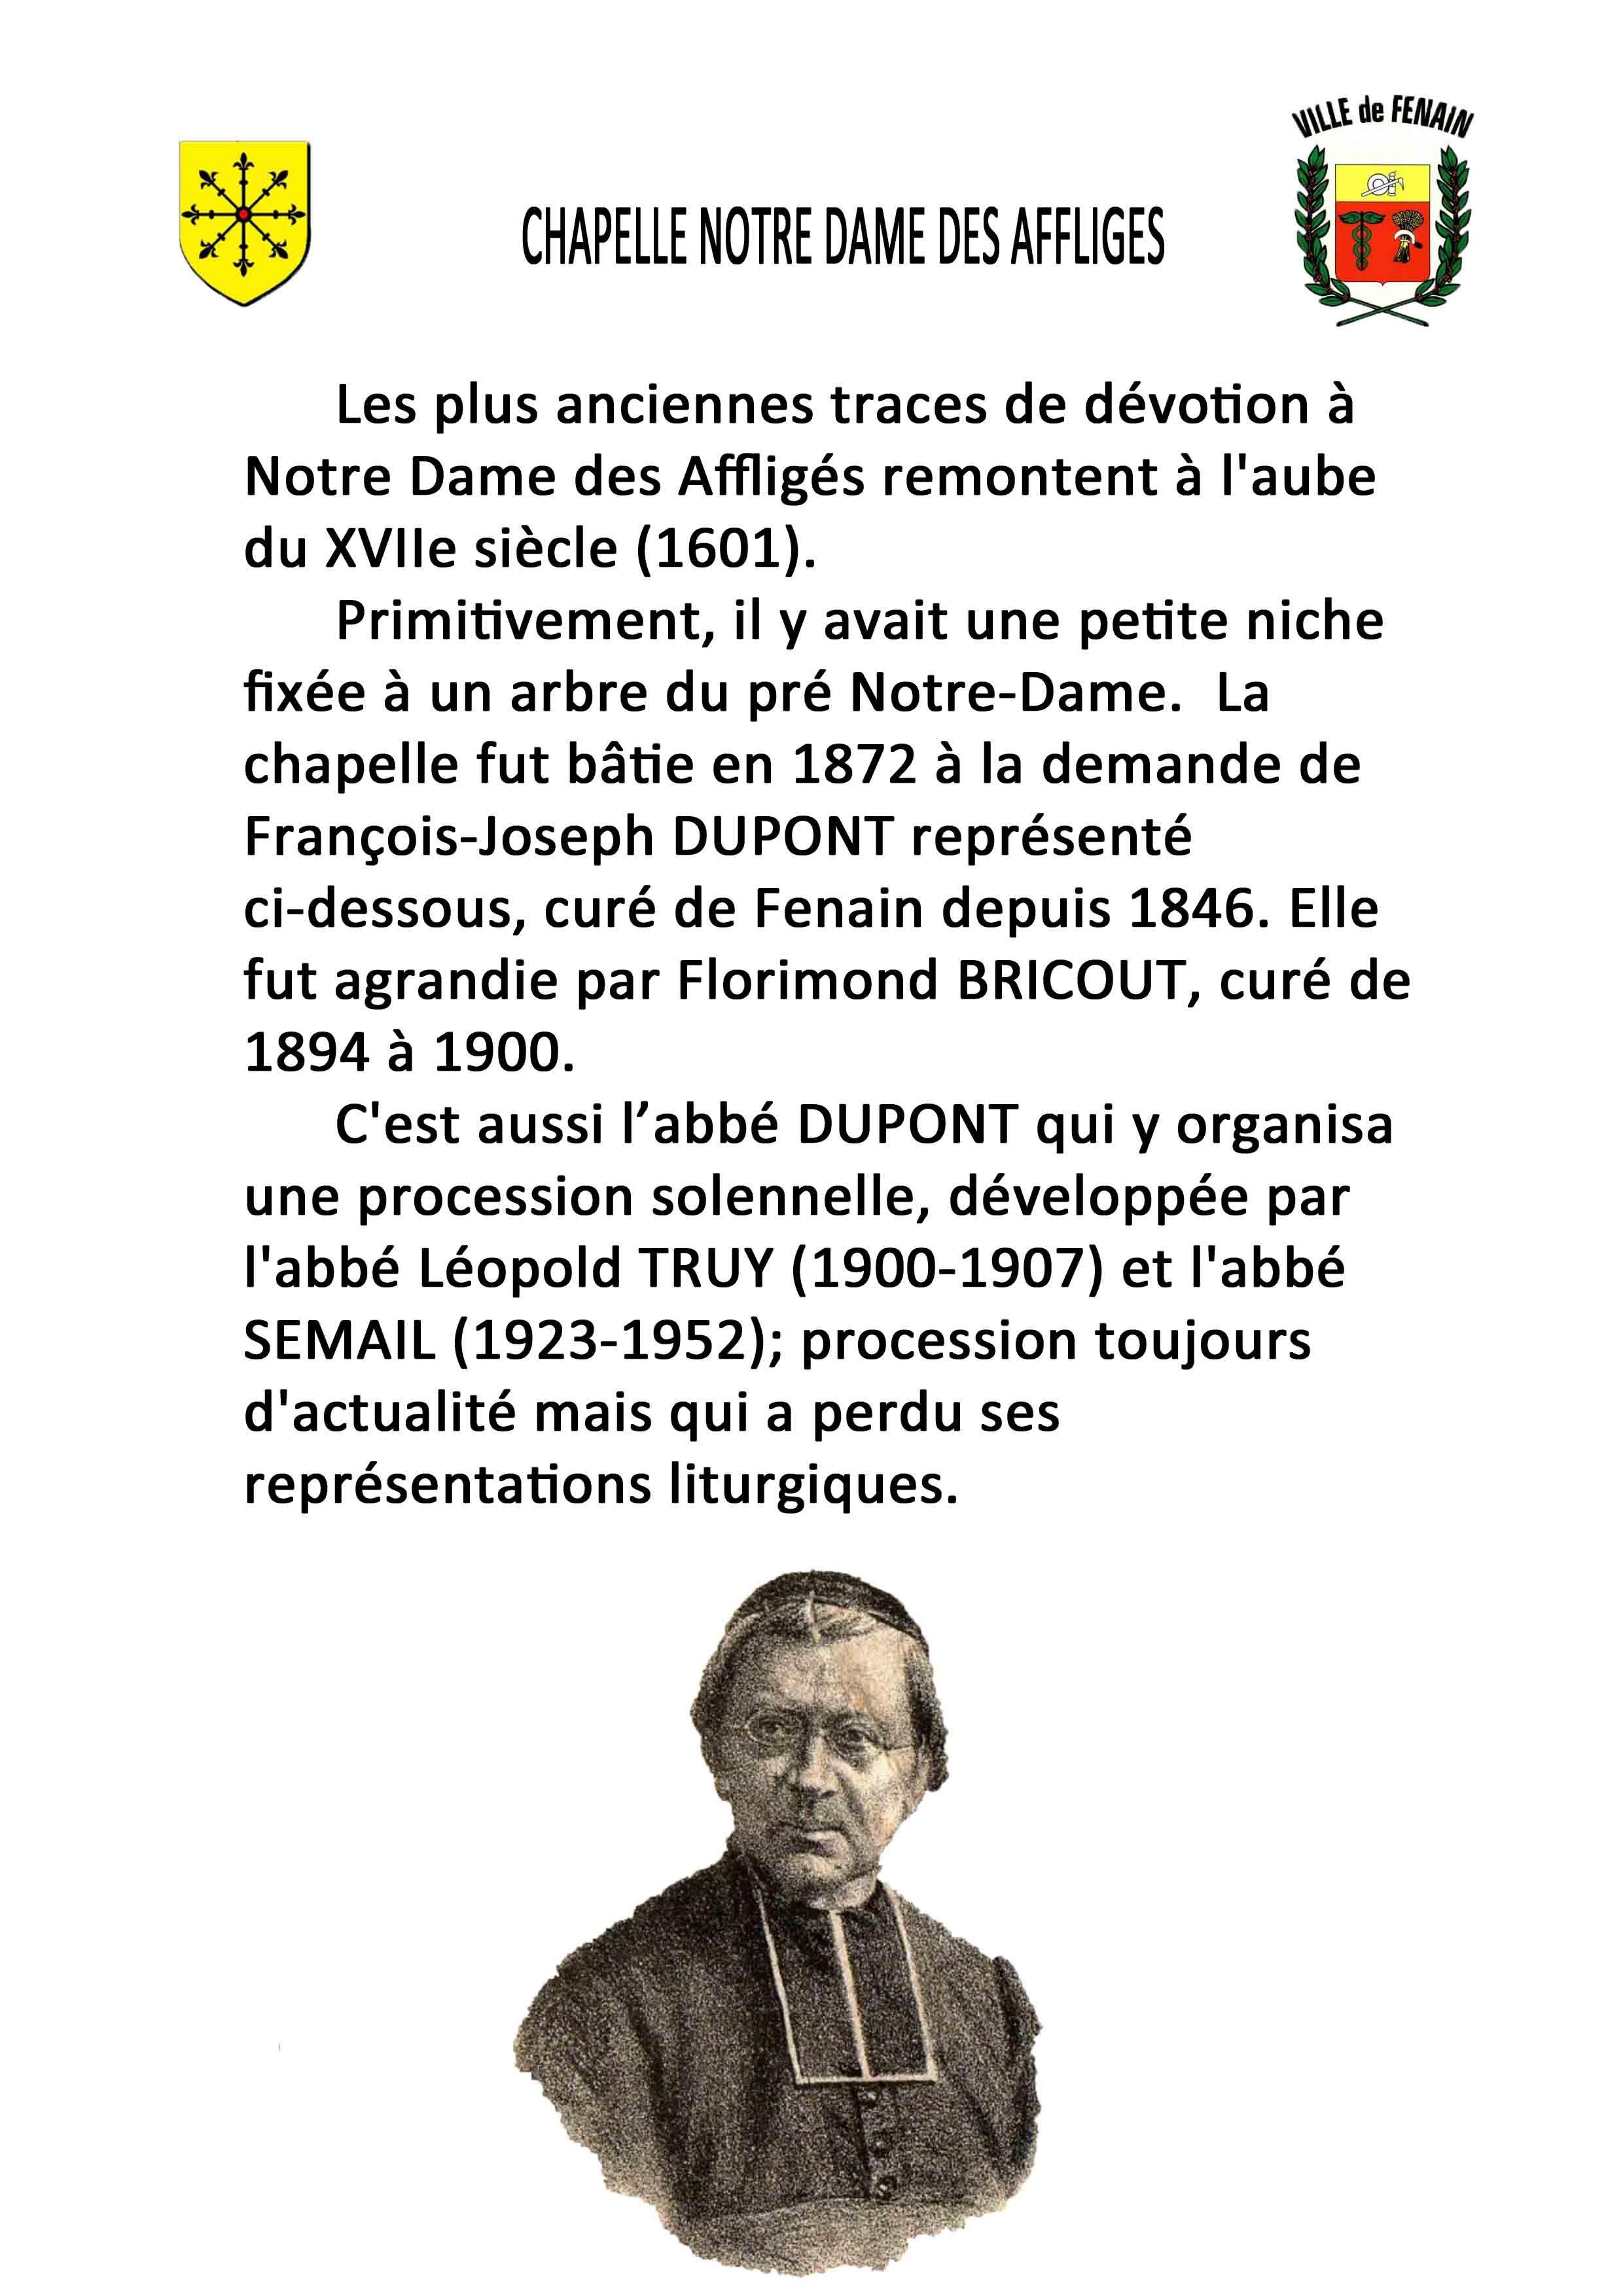 chapelle-Notre-Dame-des-Affligés-_4_.jpg